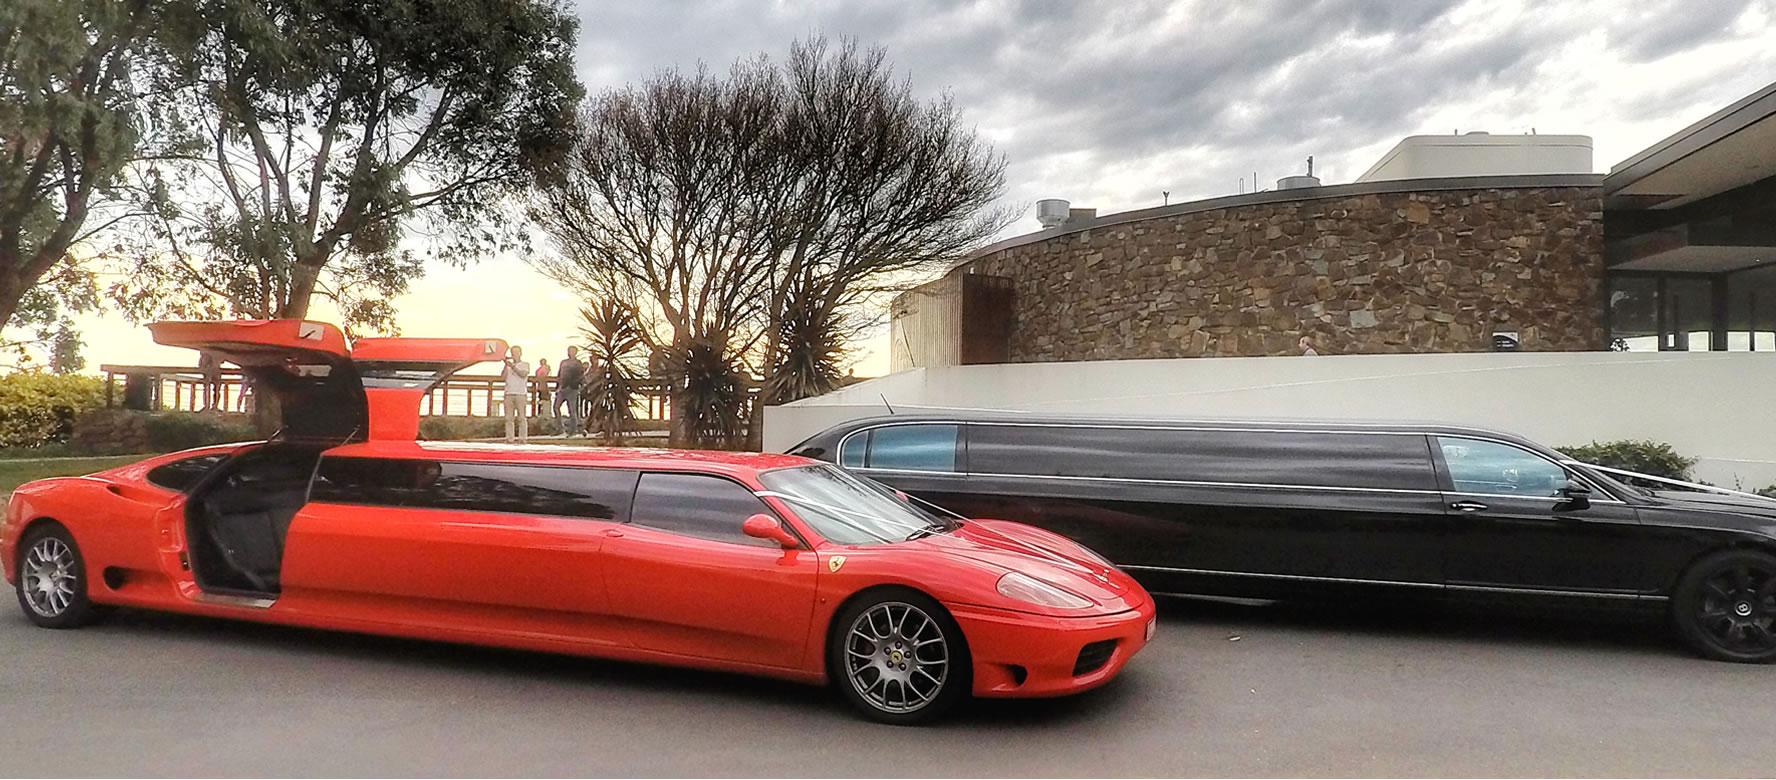 super miami huracan date lp rent melbourne side cars best price lamborghini car superveloce release rental aventador